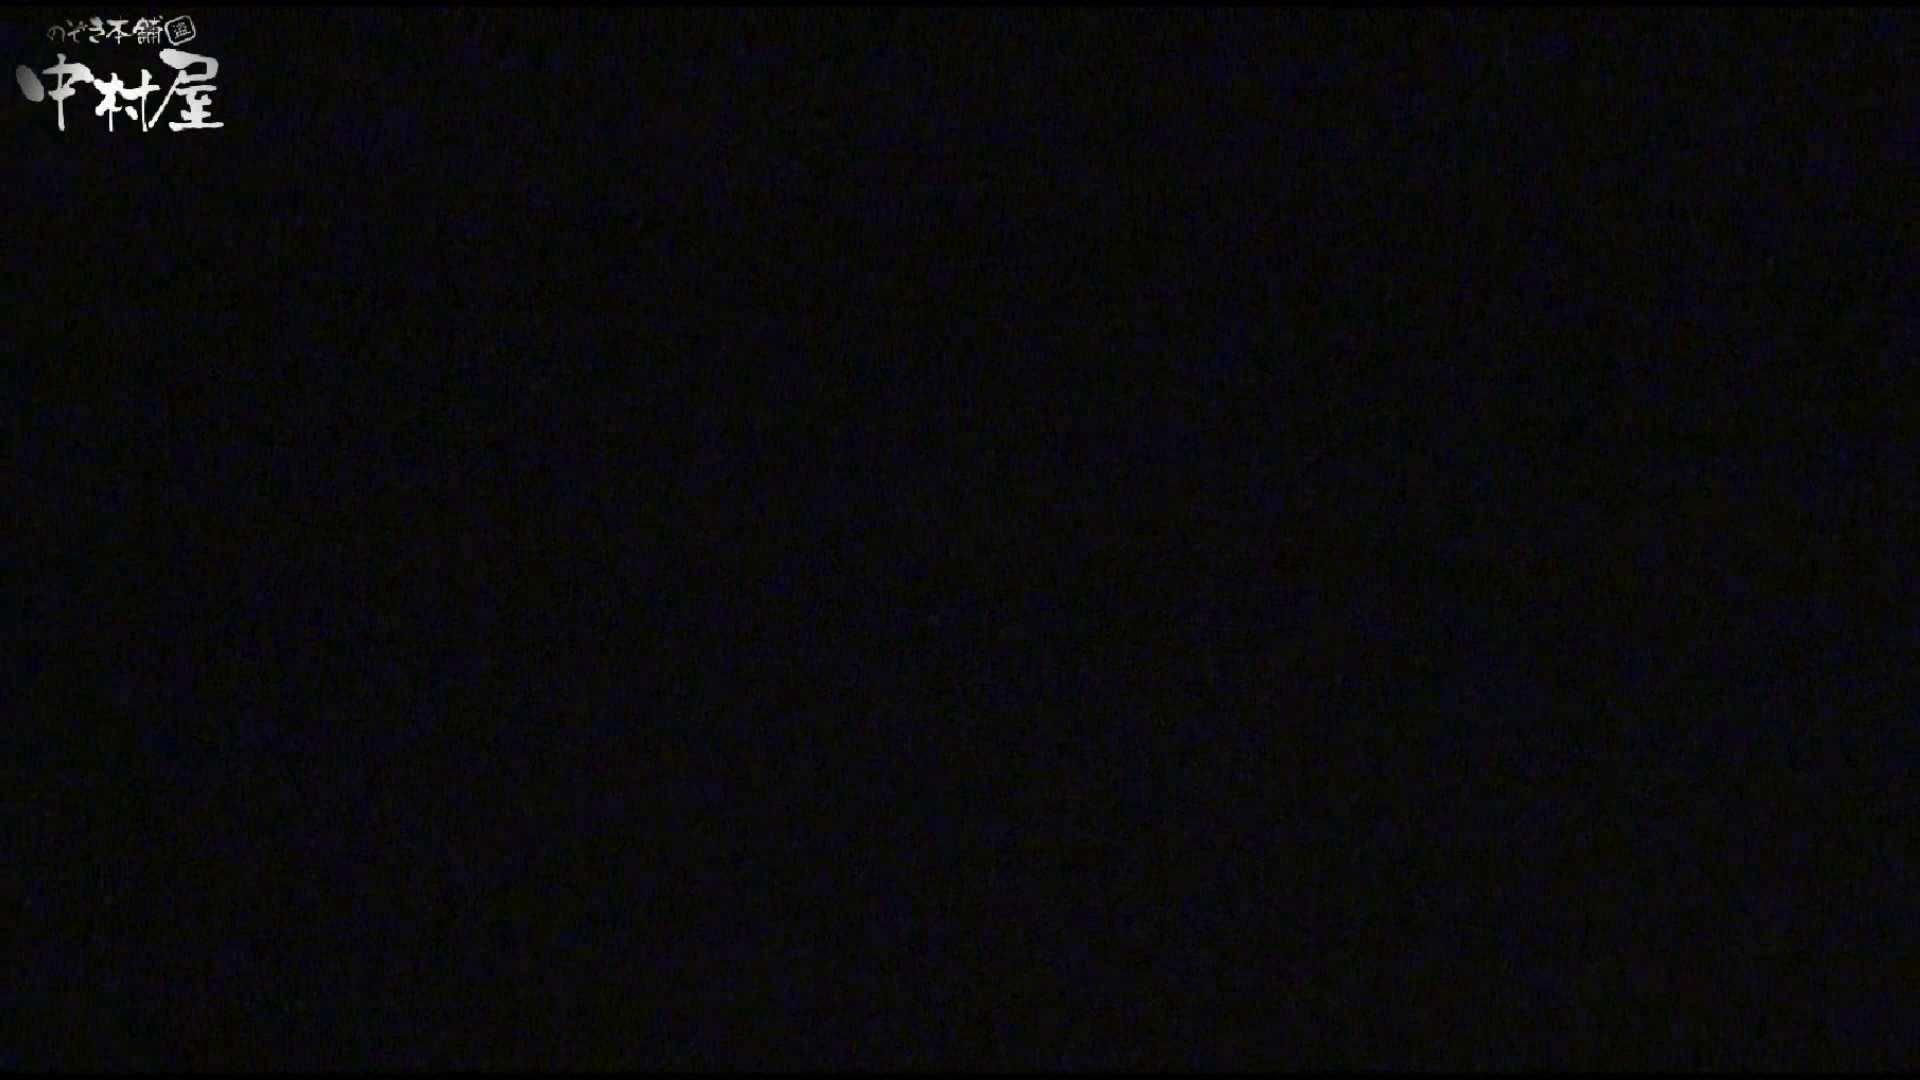 民家風呂専門盗撮師の超危険映像 vol.028 OLハメ撮り  28Pix 26